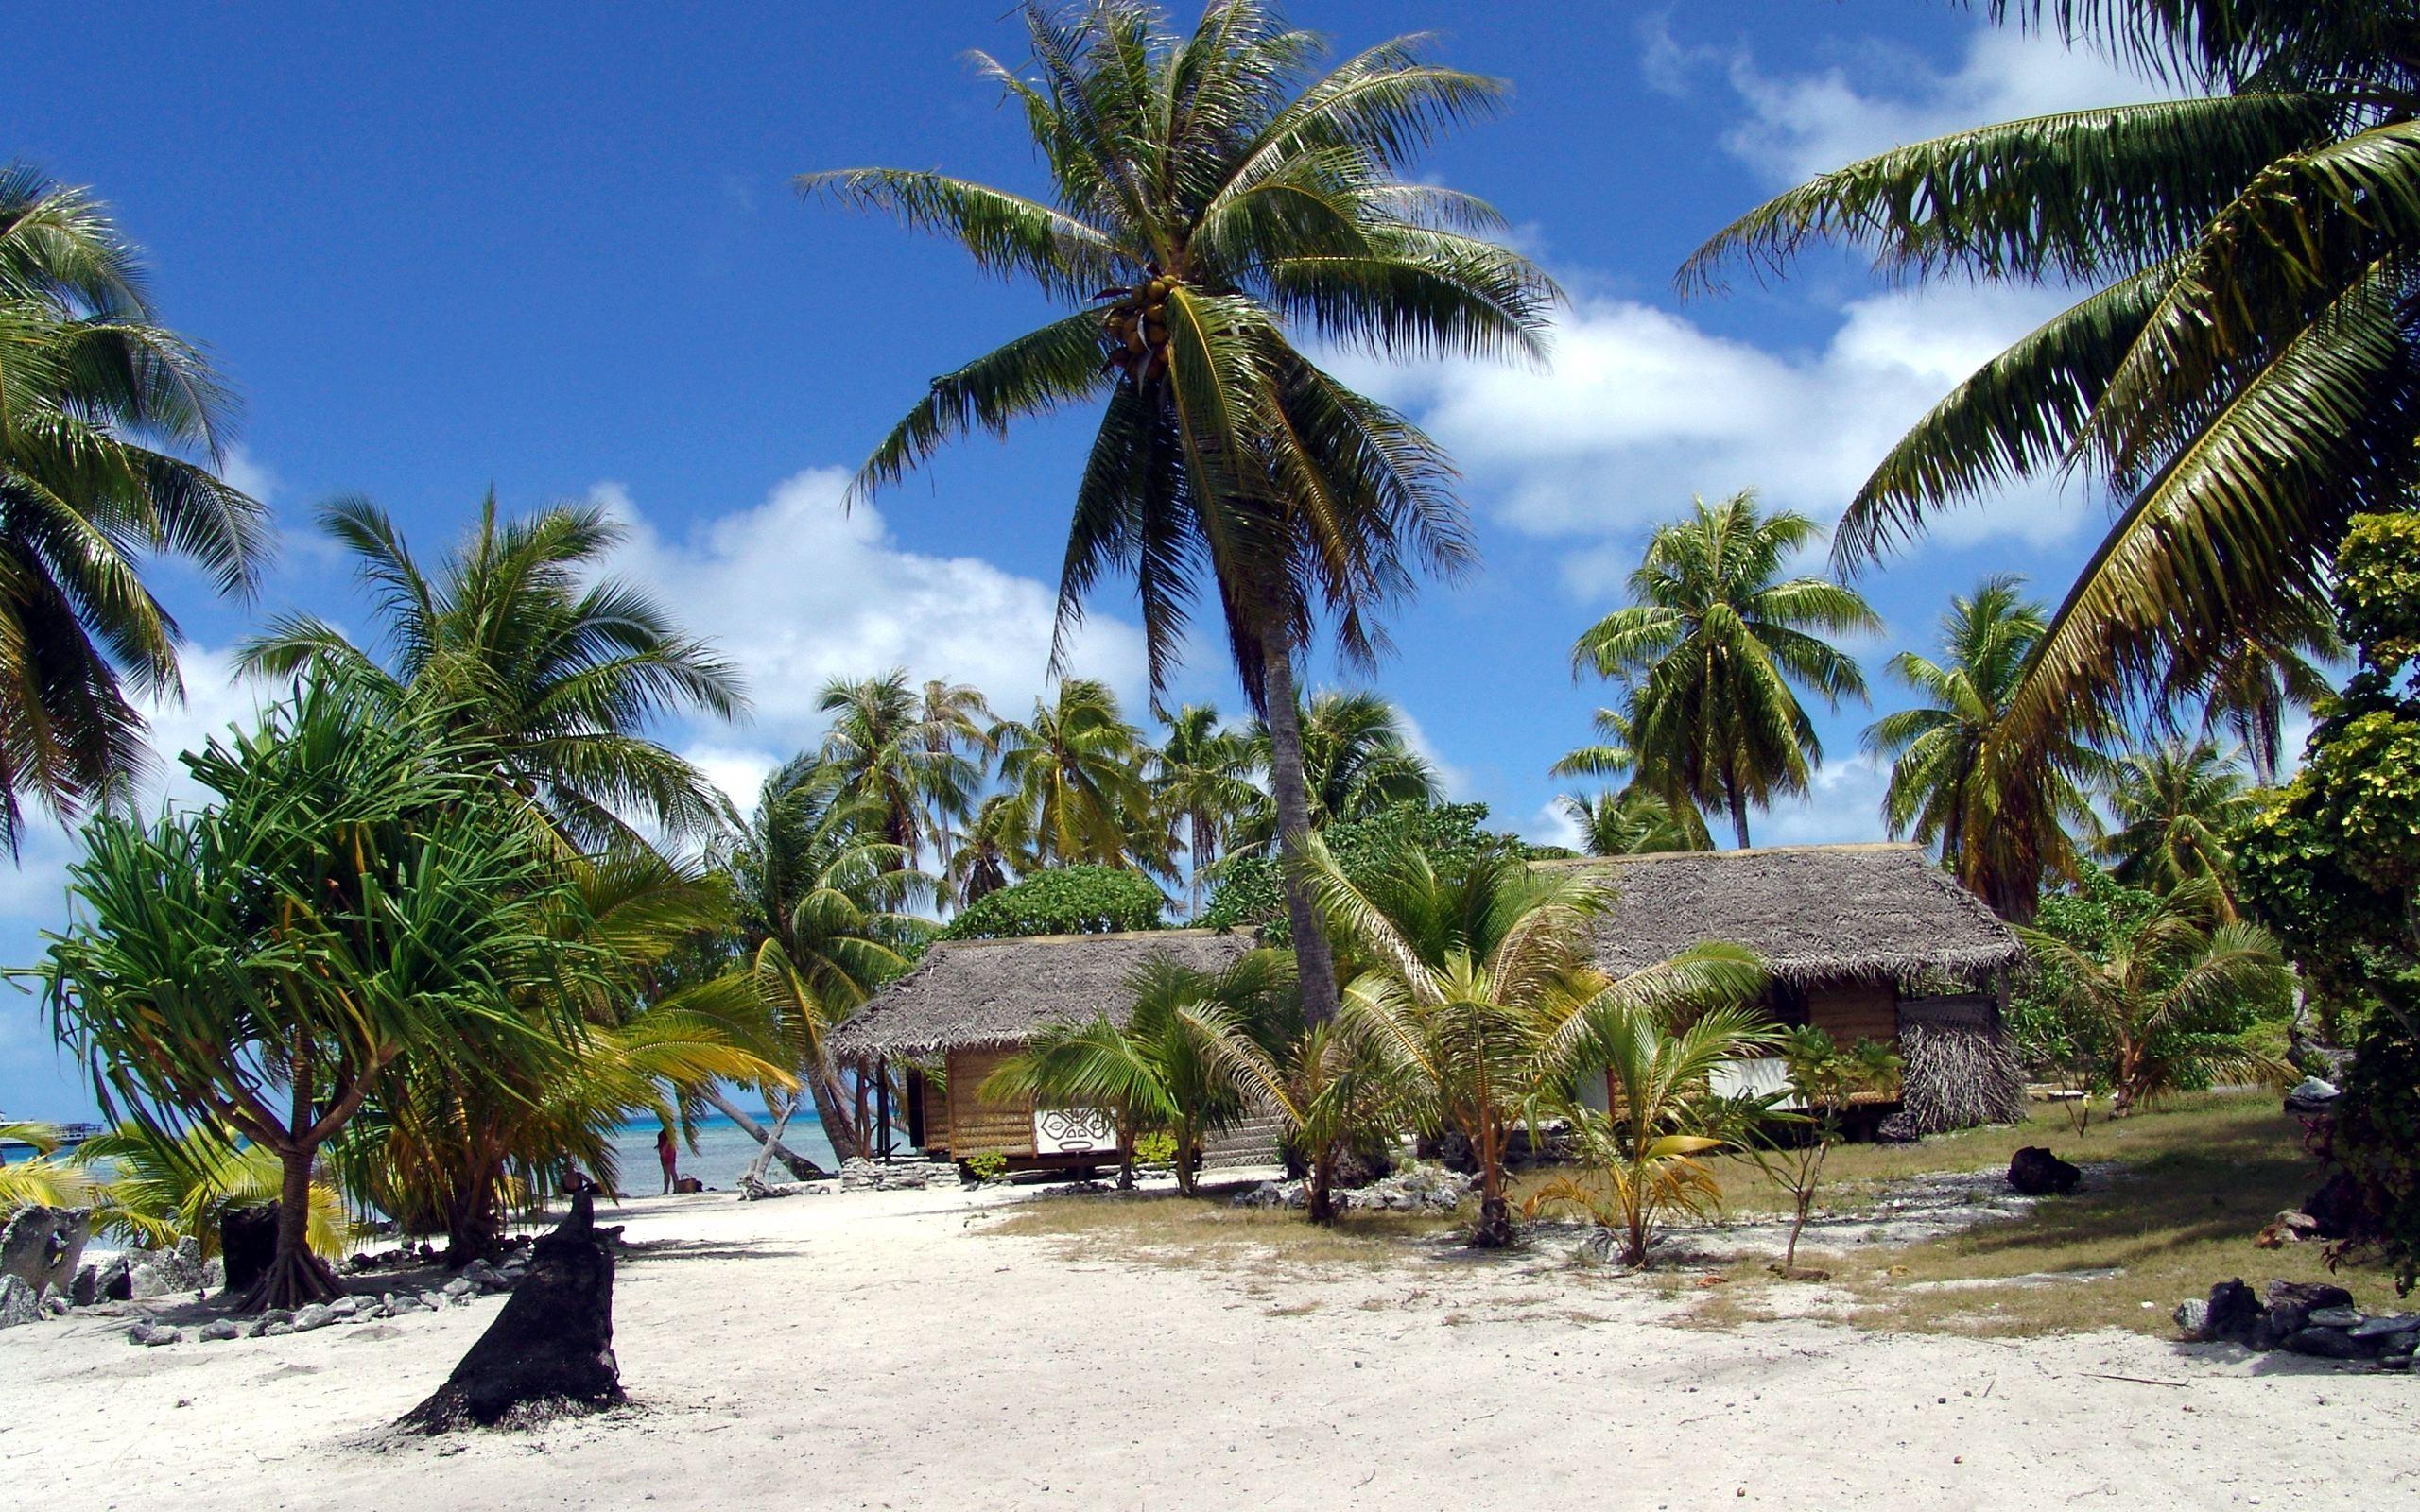 Tropical Island desktop wallpaper 2560x1600